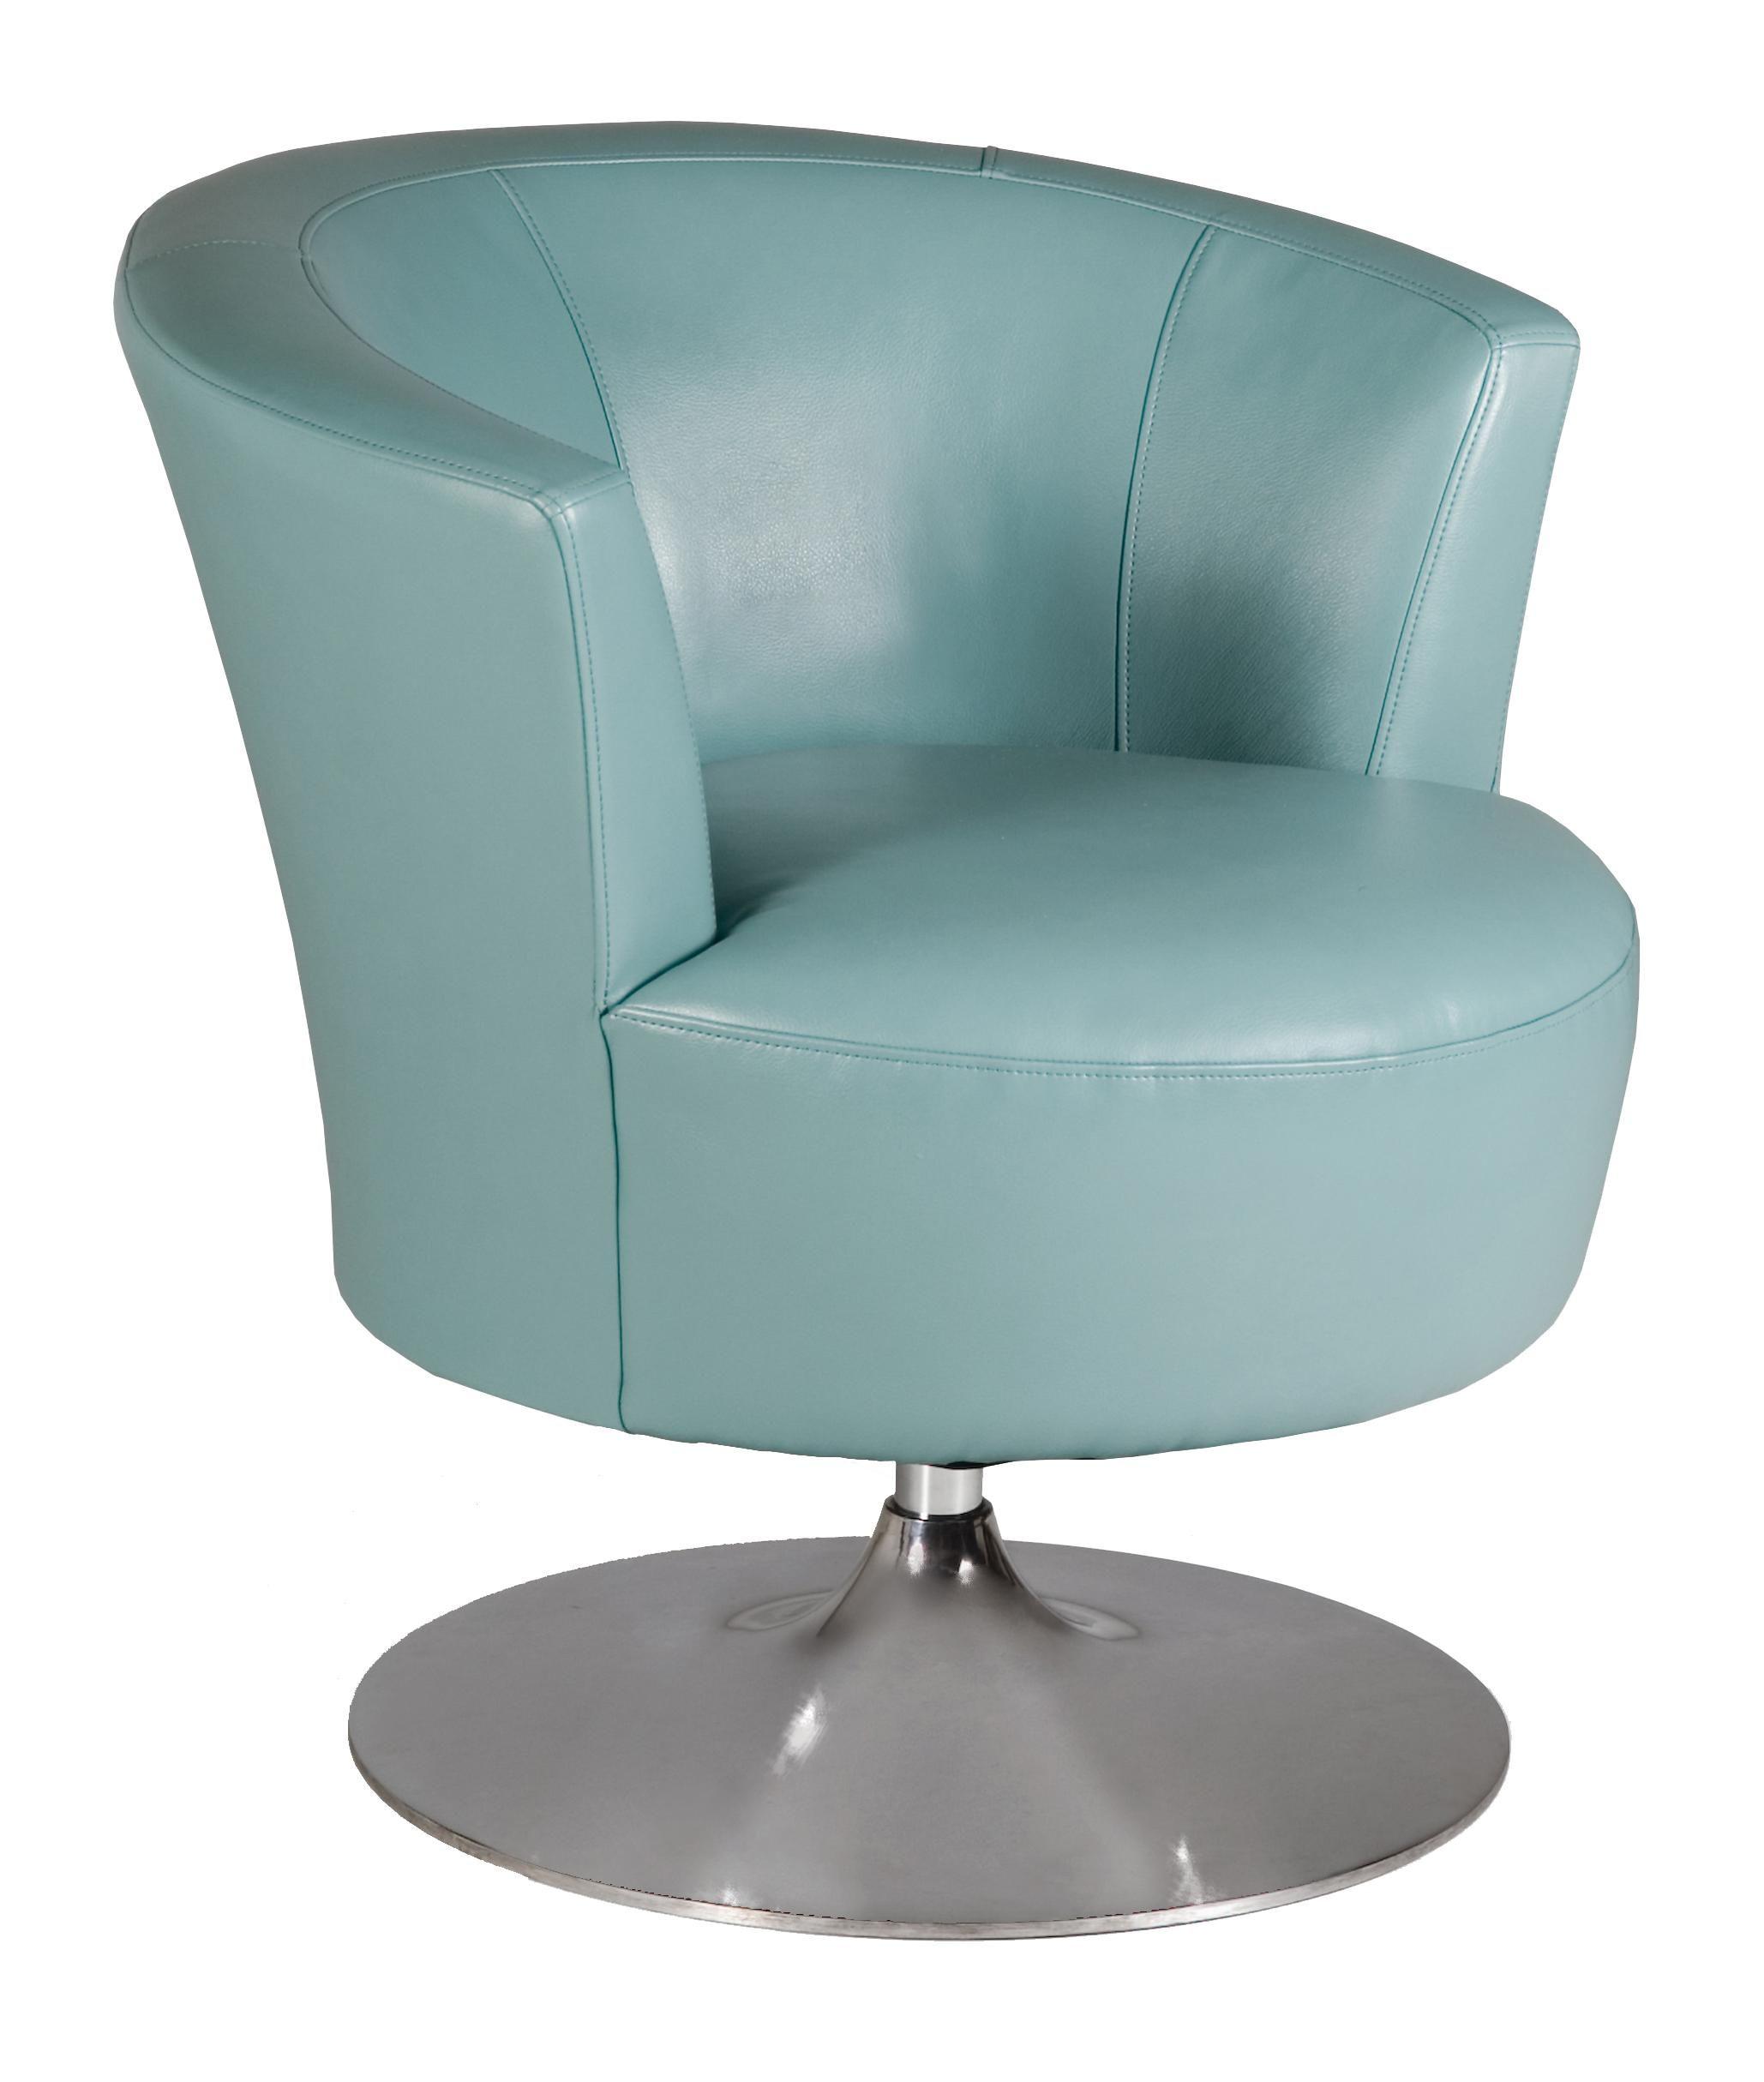 Swivel Barrel Chairs Hendrick Swivel Barrel Chair by Best Home